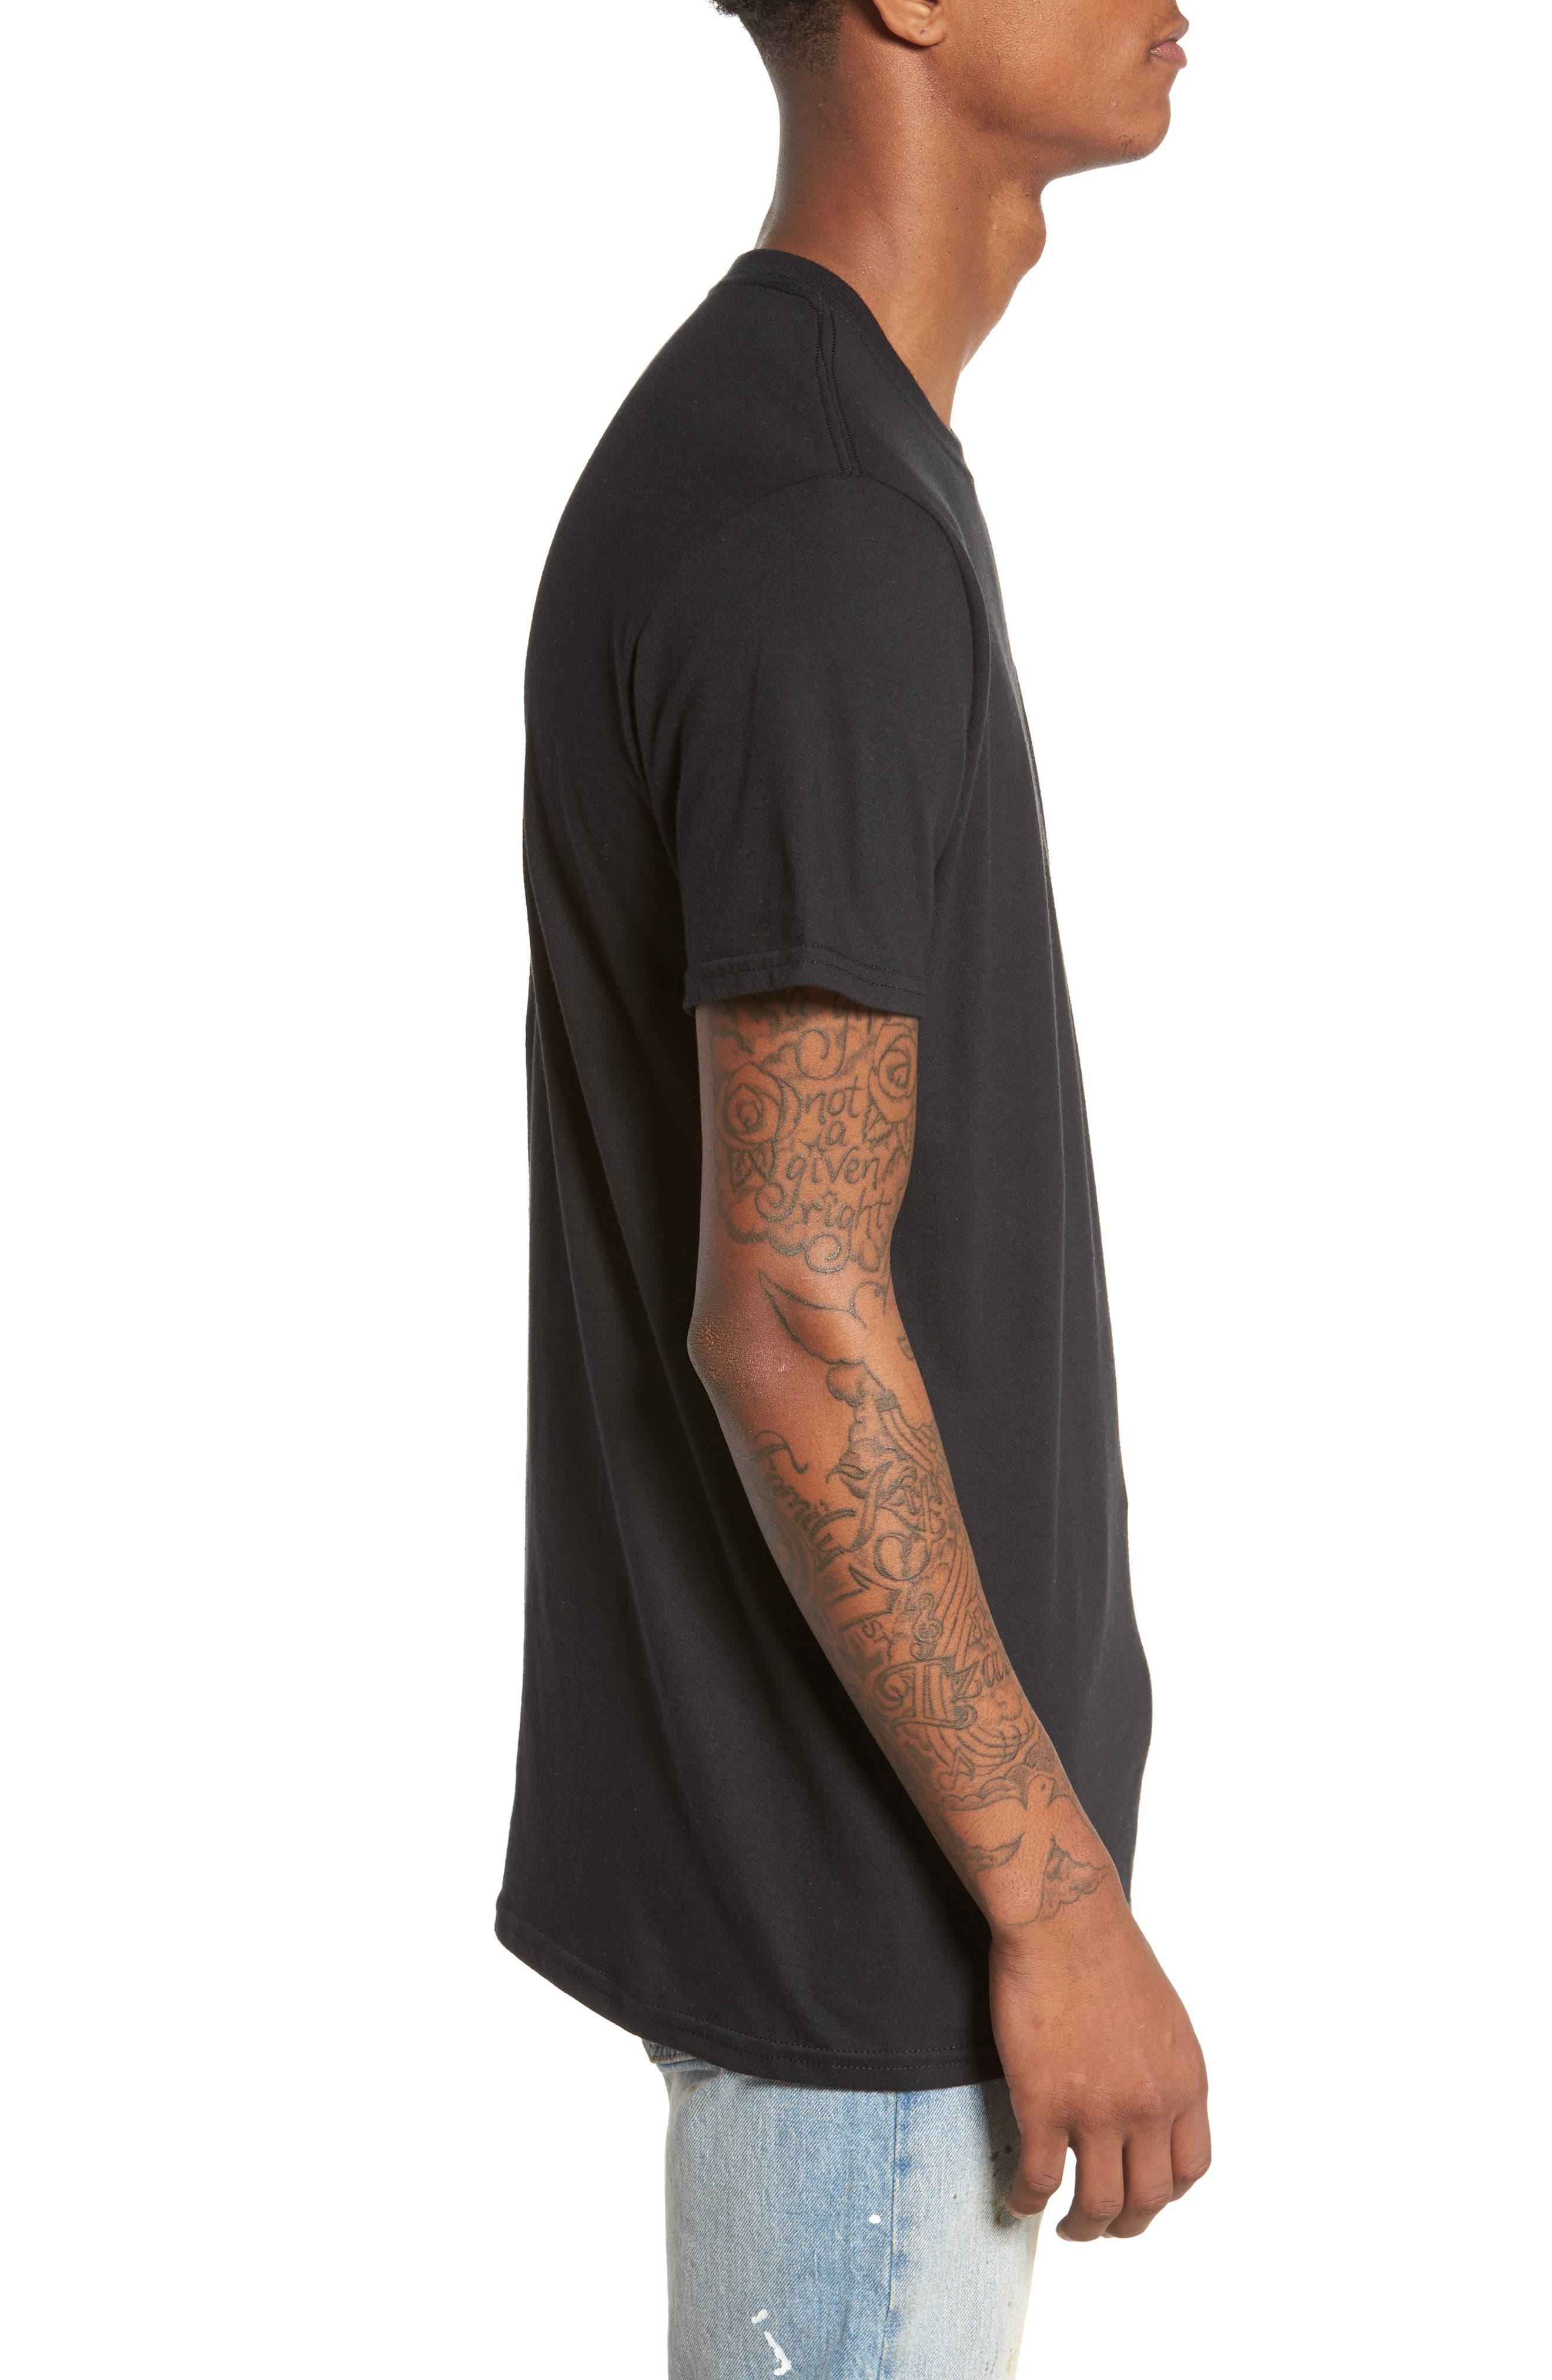 Blessed T-Shirt,                             Alternate thumbnail 3, color,                             Black Blessed